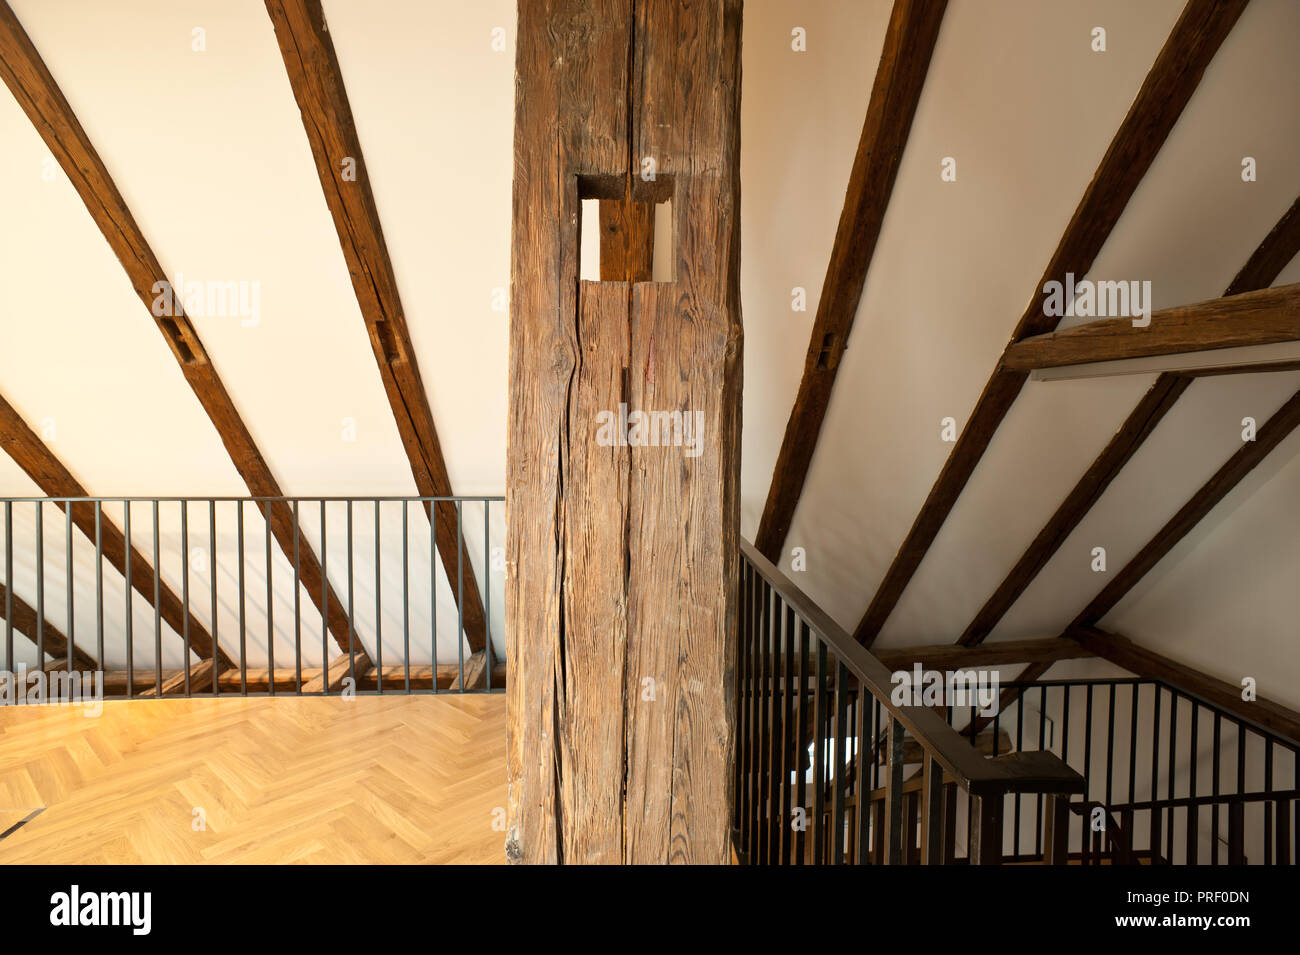 Wien, Bankgasse, Concordia-Haus, Dachbodenausbau Stock Photo